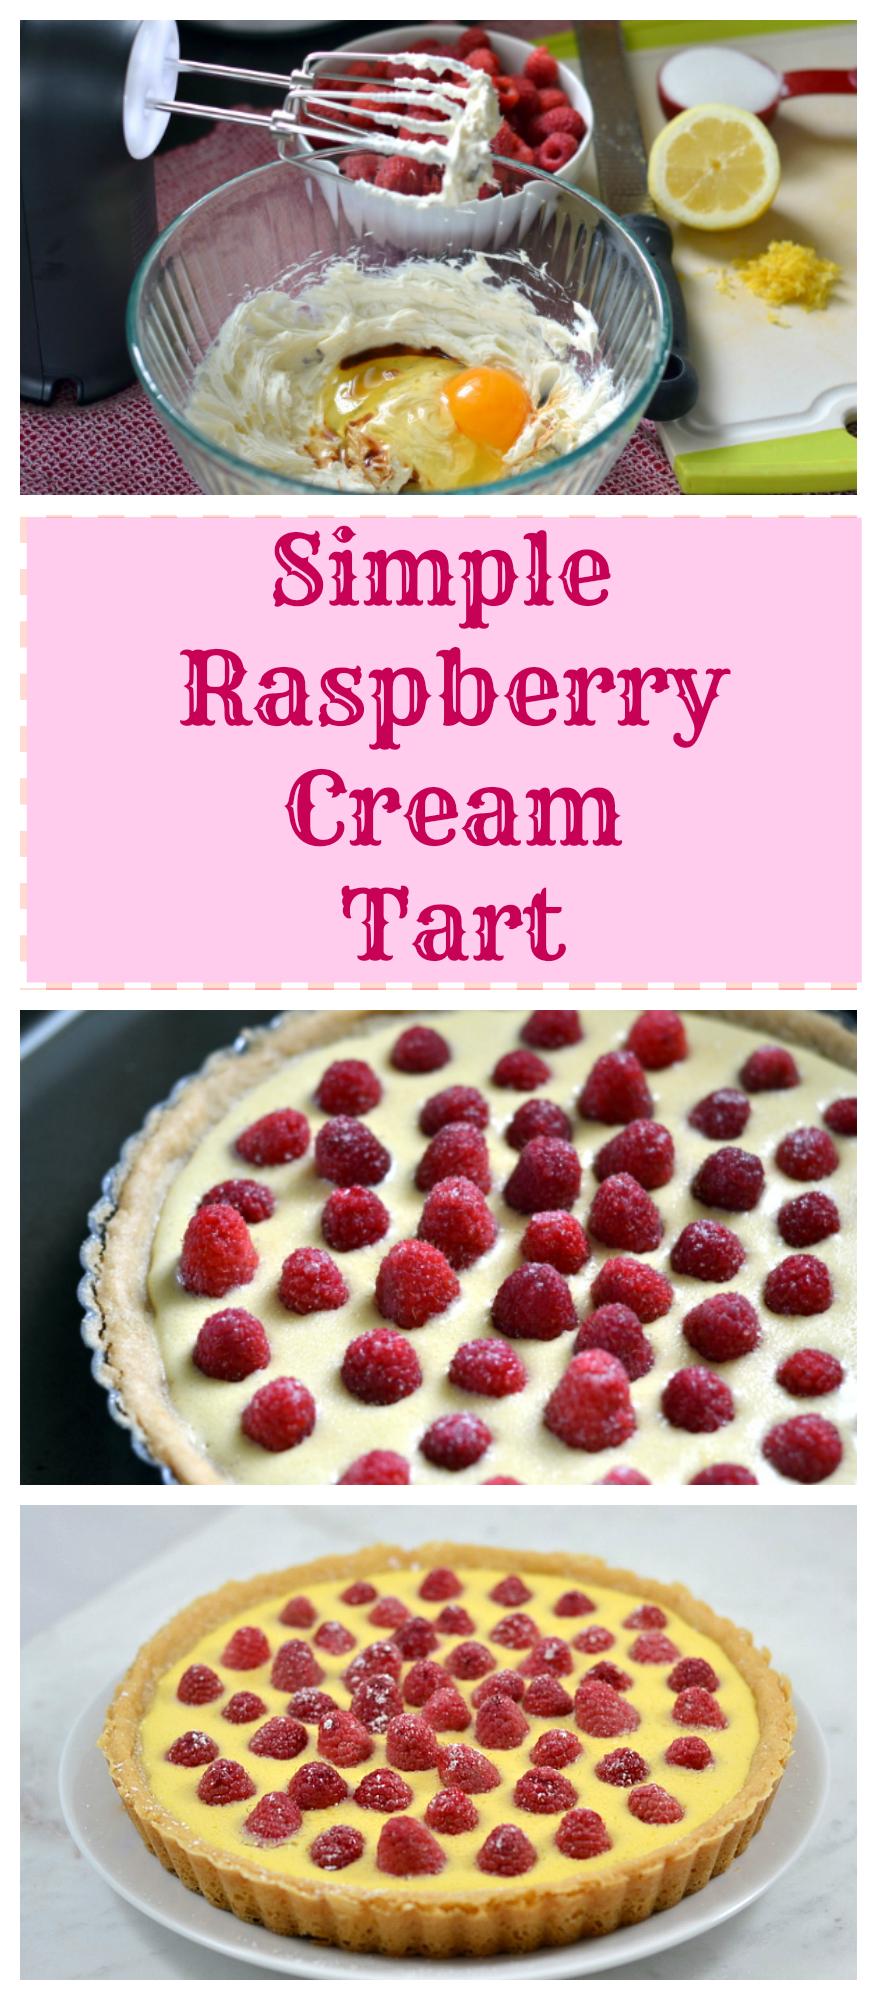 Simple Raspberry Cream Tart -Chew Nibble Nosh